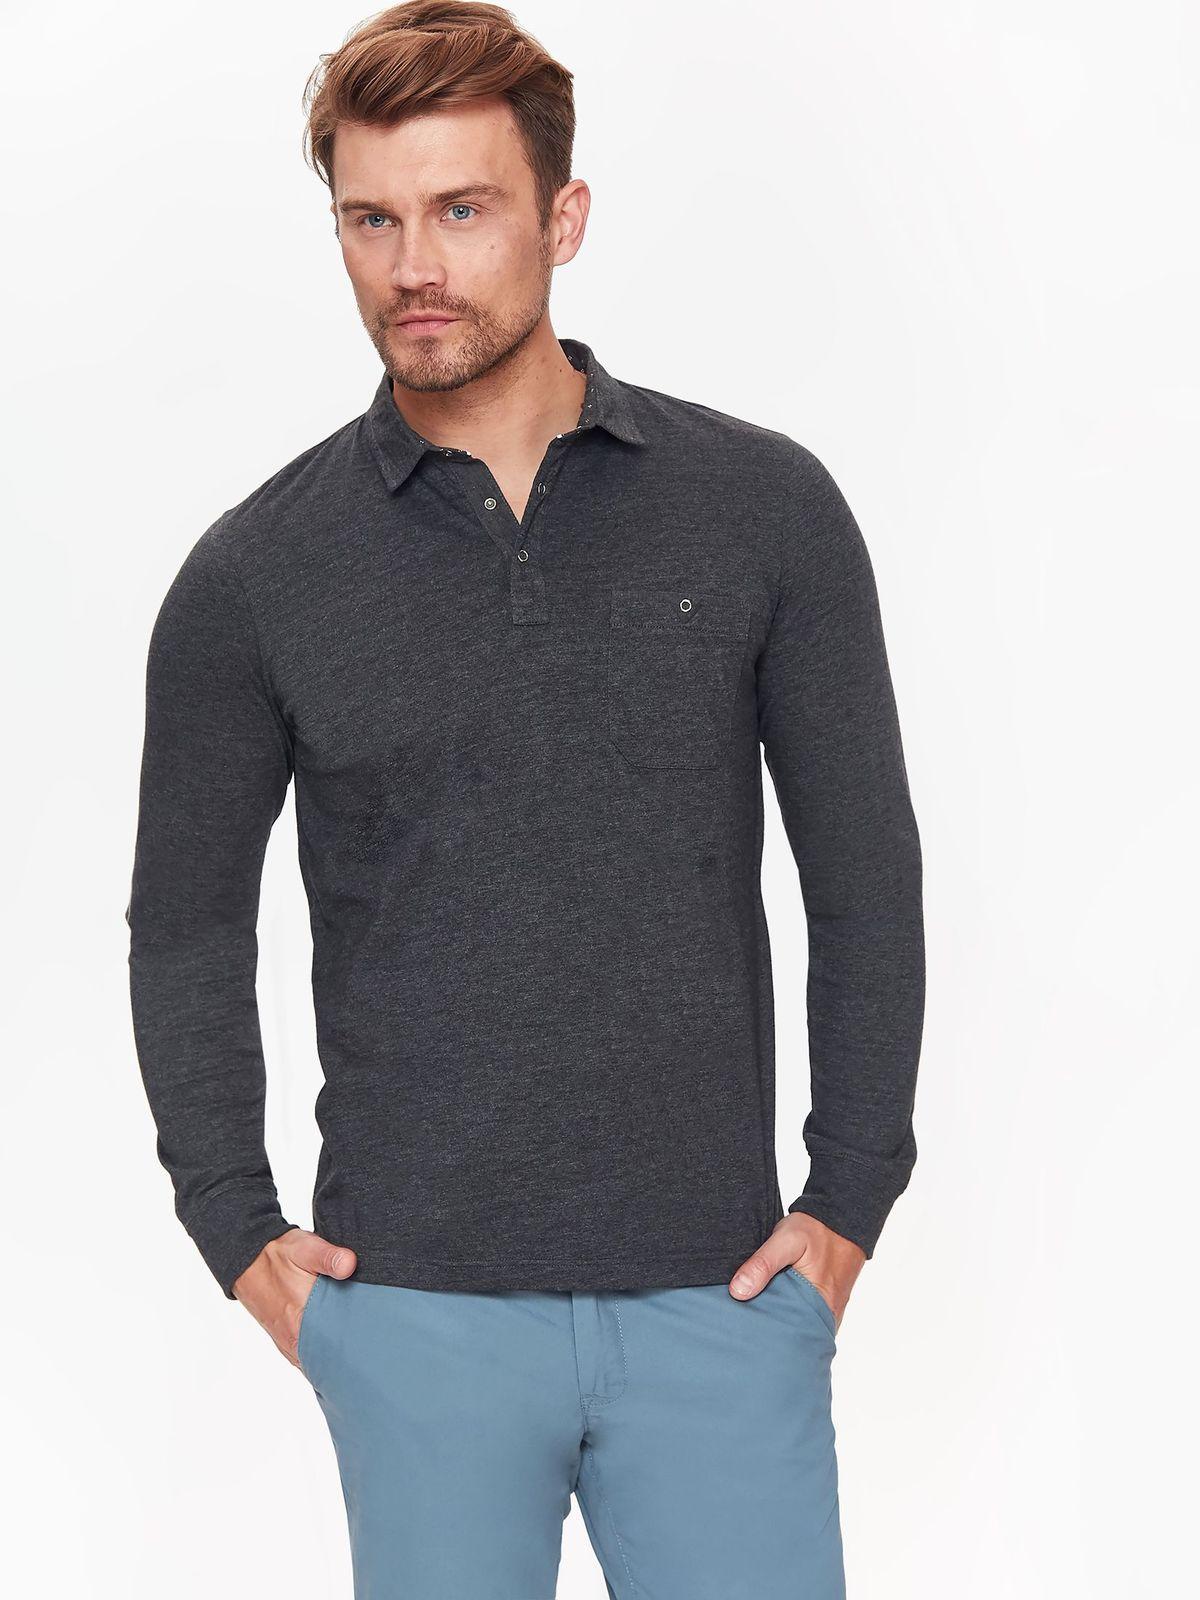 TOP SECRET ανδρικη μπλουζα τυπου polo